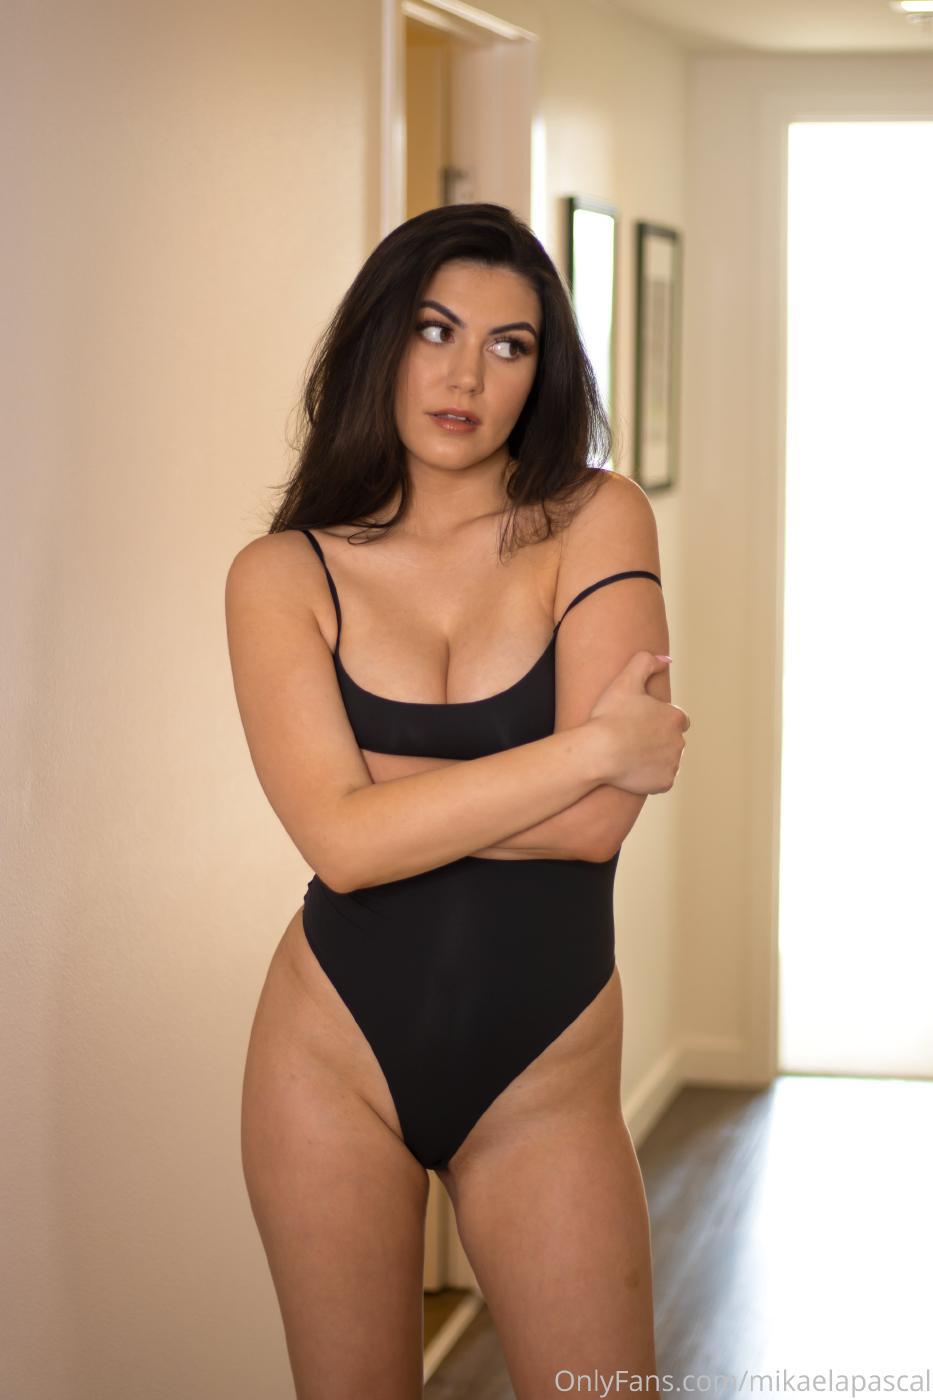 Mikaela Pascal Topless Bodysuit Onlyfans Set Leaked Thbxjk